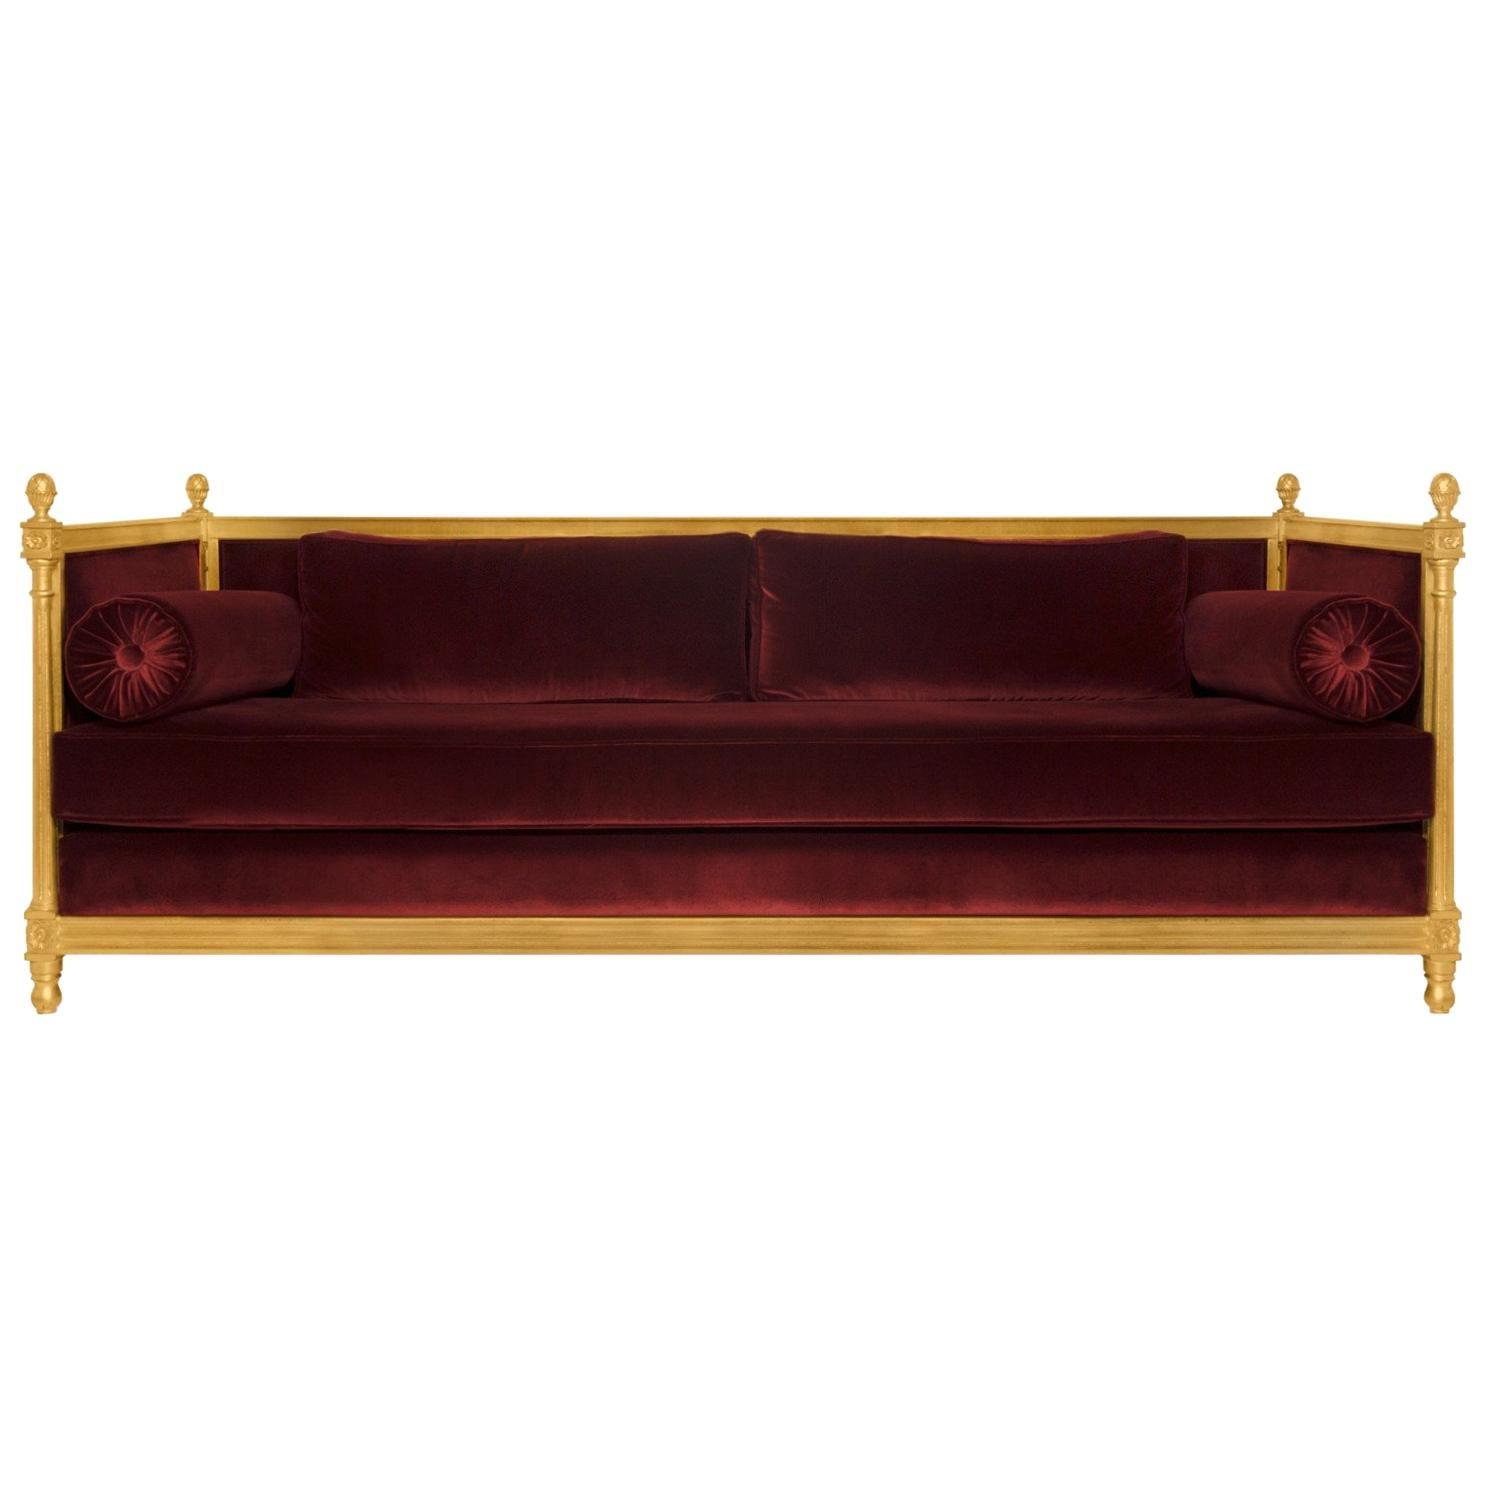 Malkiy Sofa in Cotton Velvet with Gold Details